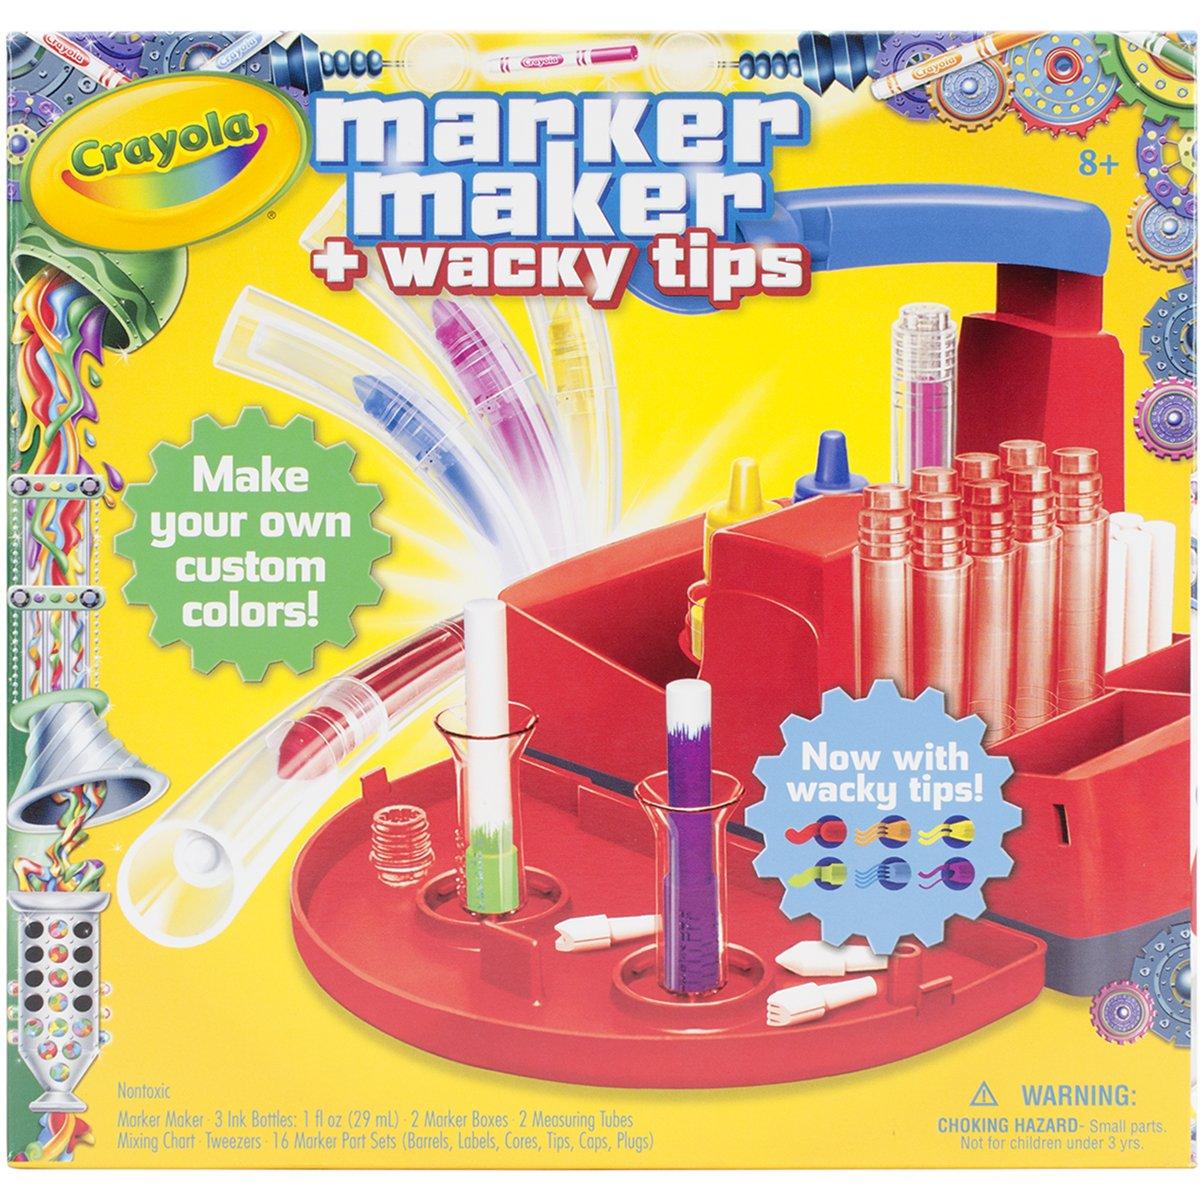 Crayola Marker Maker Wacky Tip...